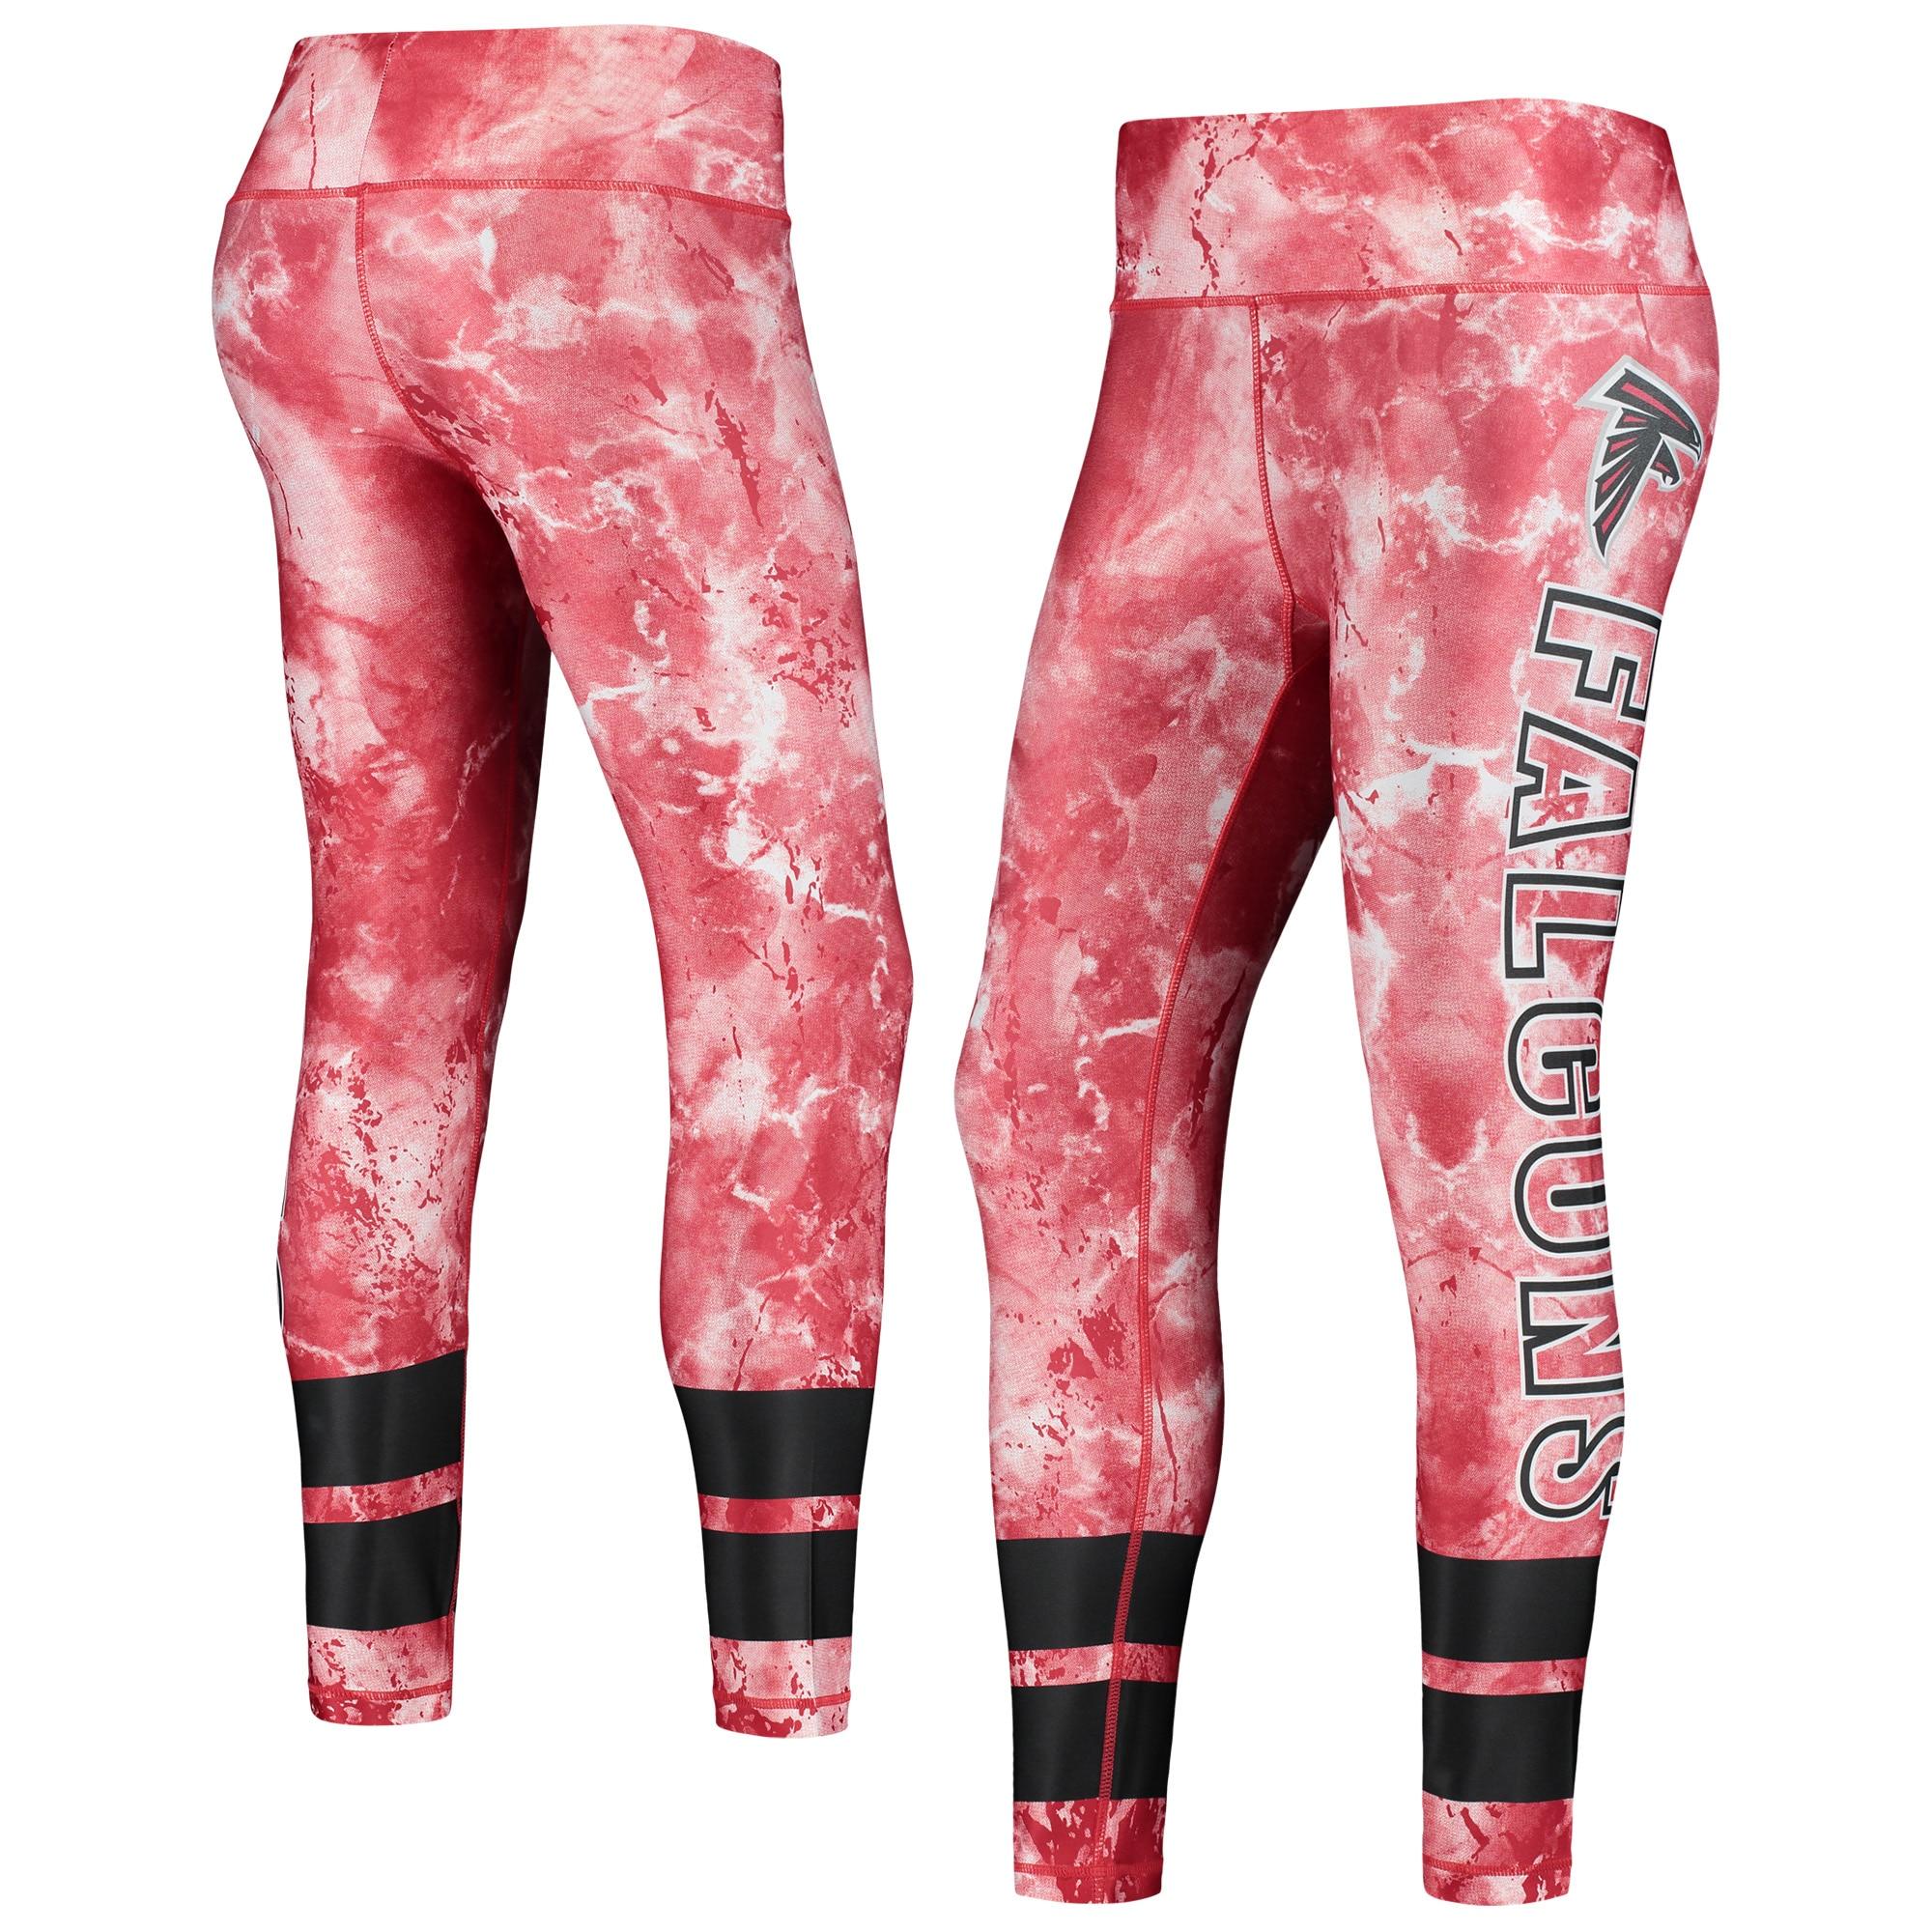 Atlanta Falcons Concepts Sport Women's Dormer Knit Leggings - Red/Black